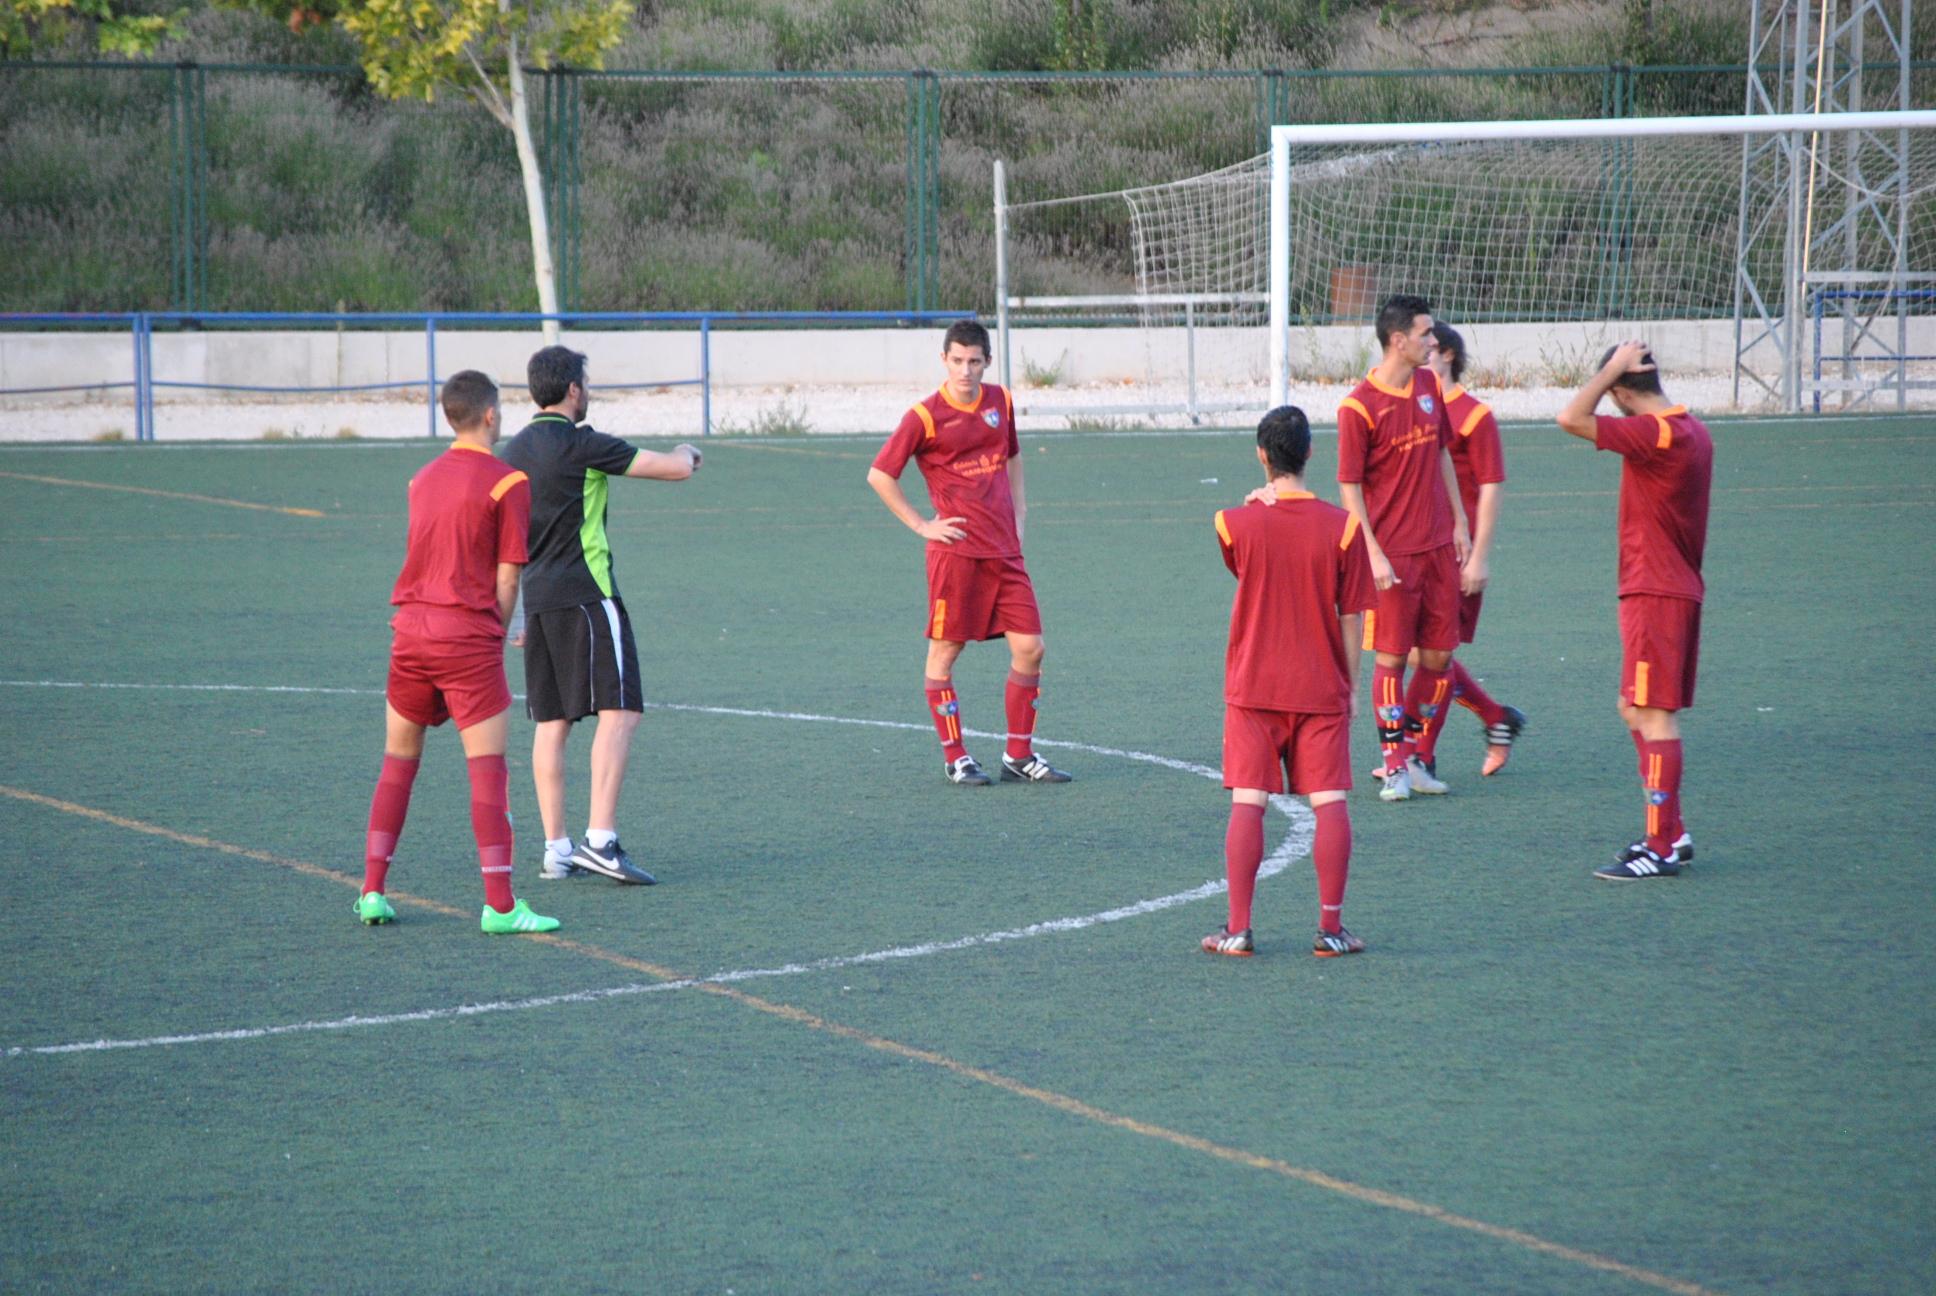 El Aficionado B recibe este domingo a la EF AV La Chimenea A